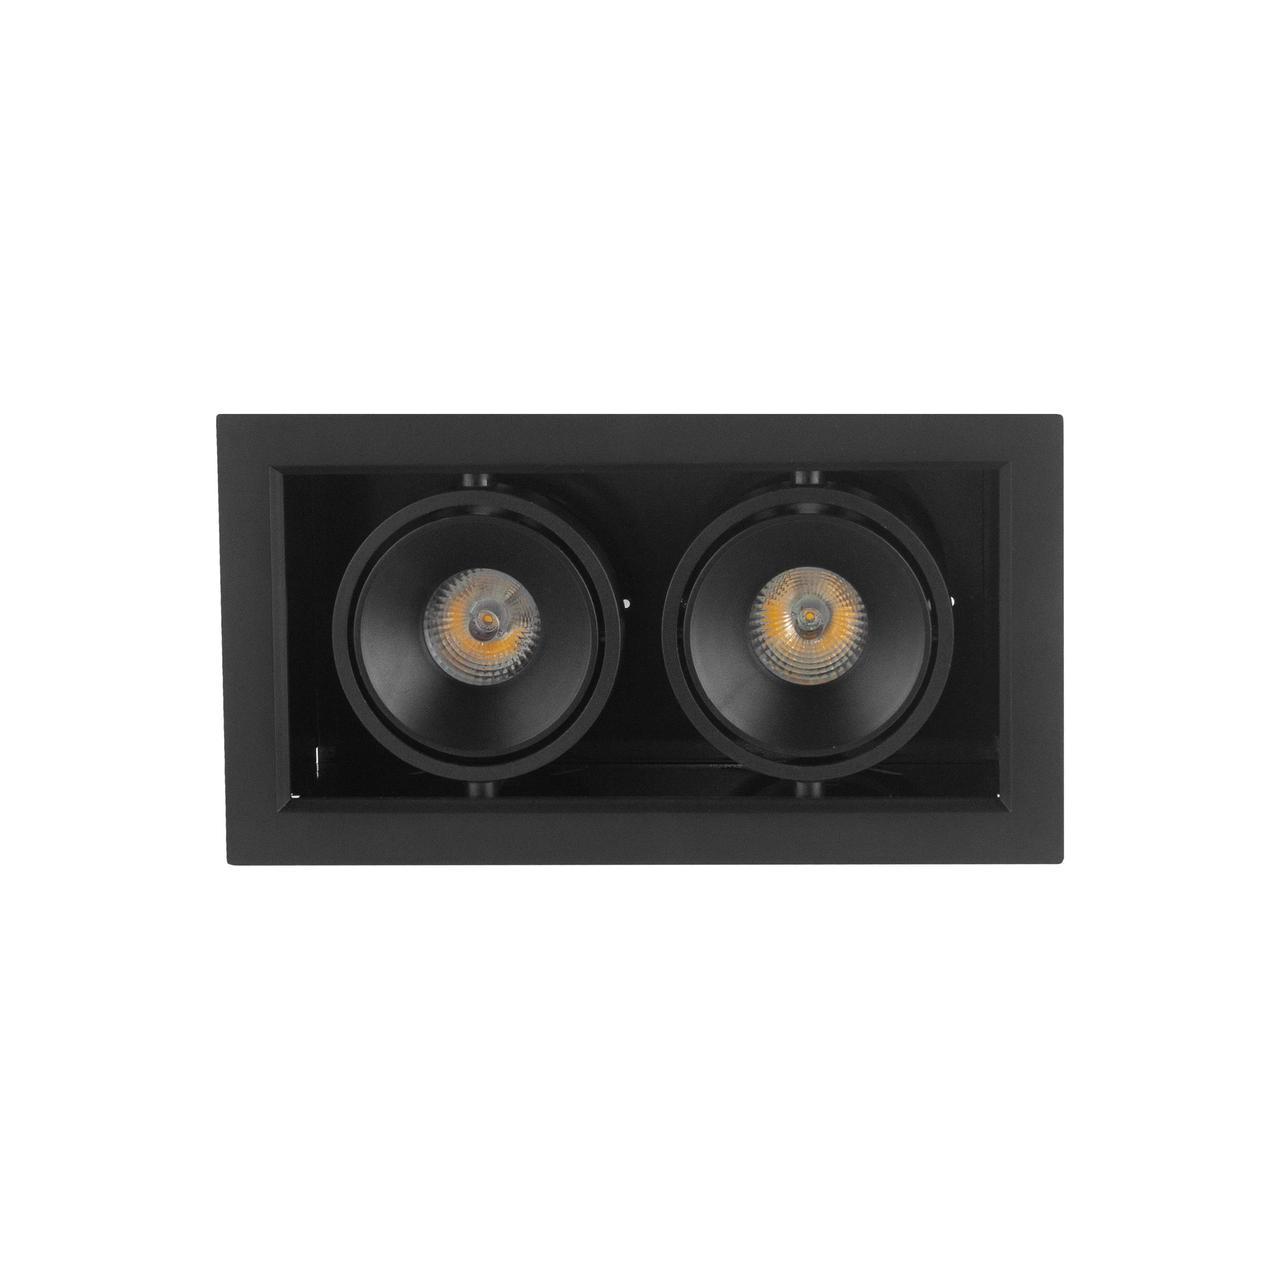 Точечный светильник Skarlat  BX07-2-LED 2*7W BK 4000K